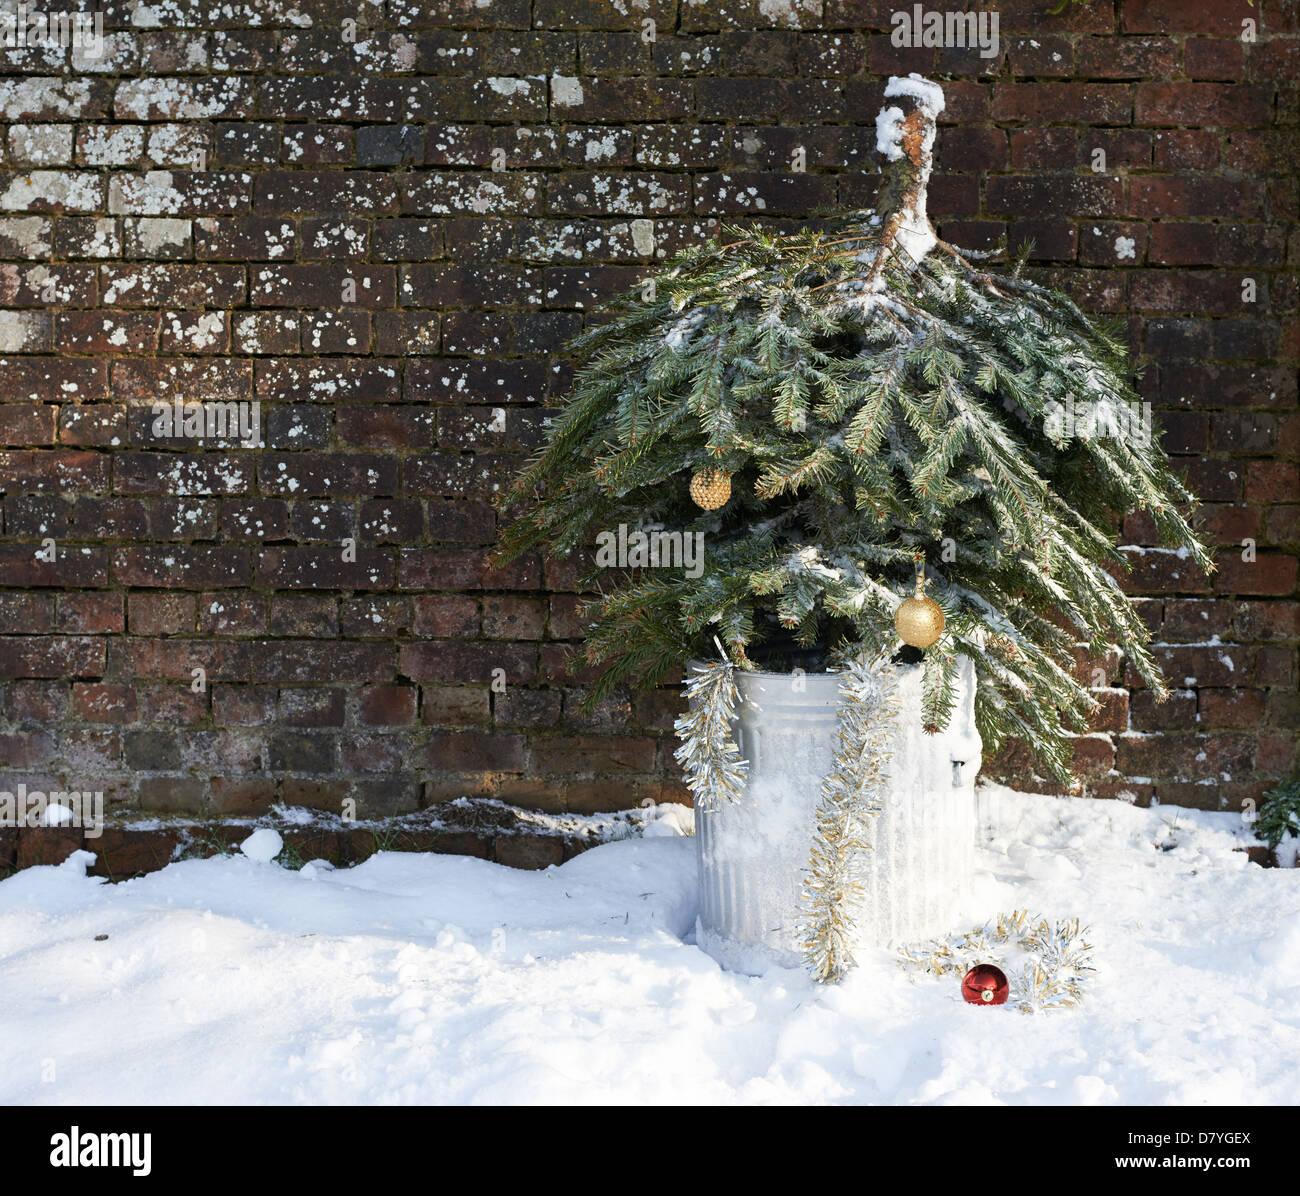 Where To Buy An Upside Down Christmas Tree